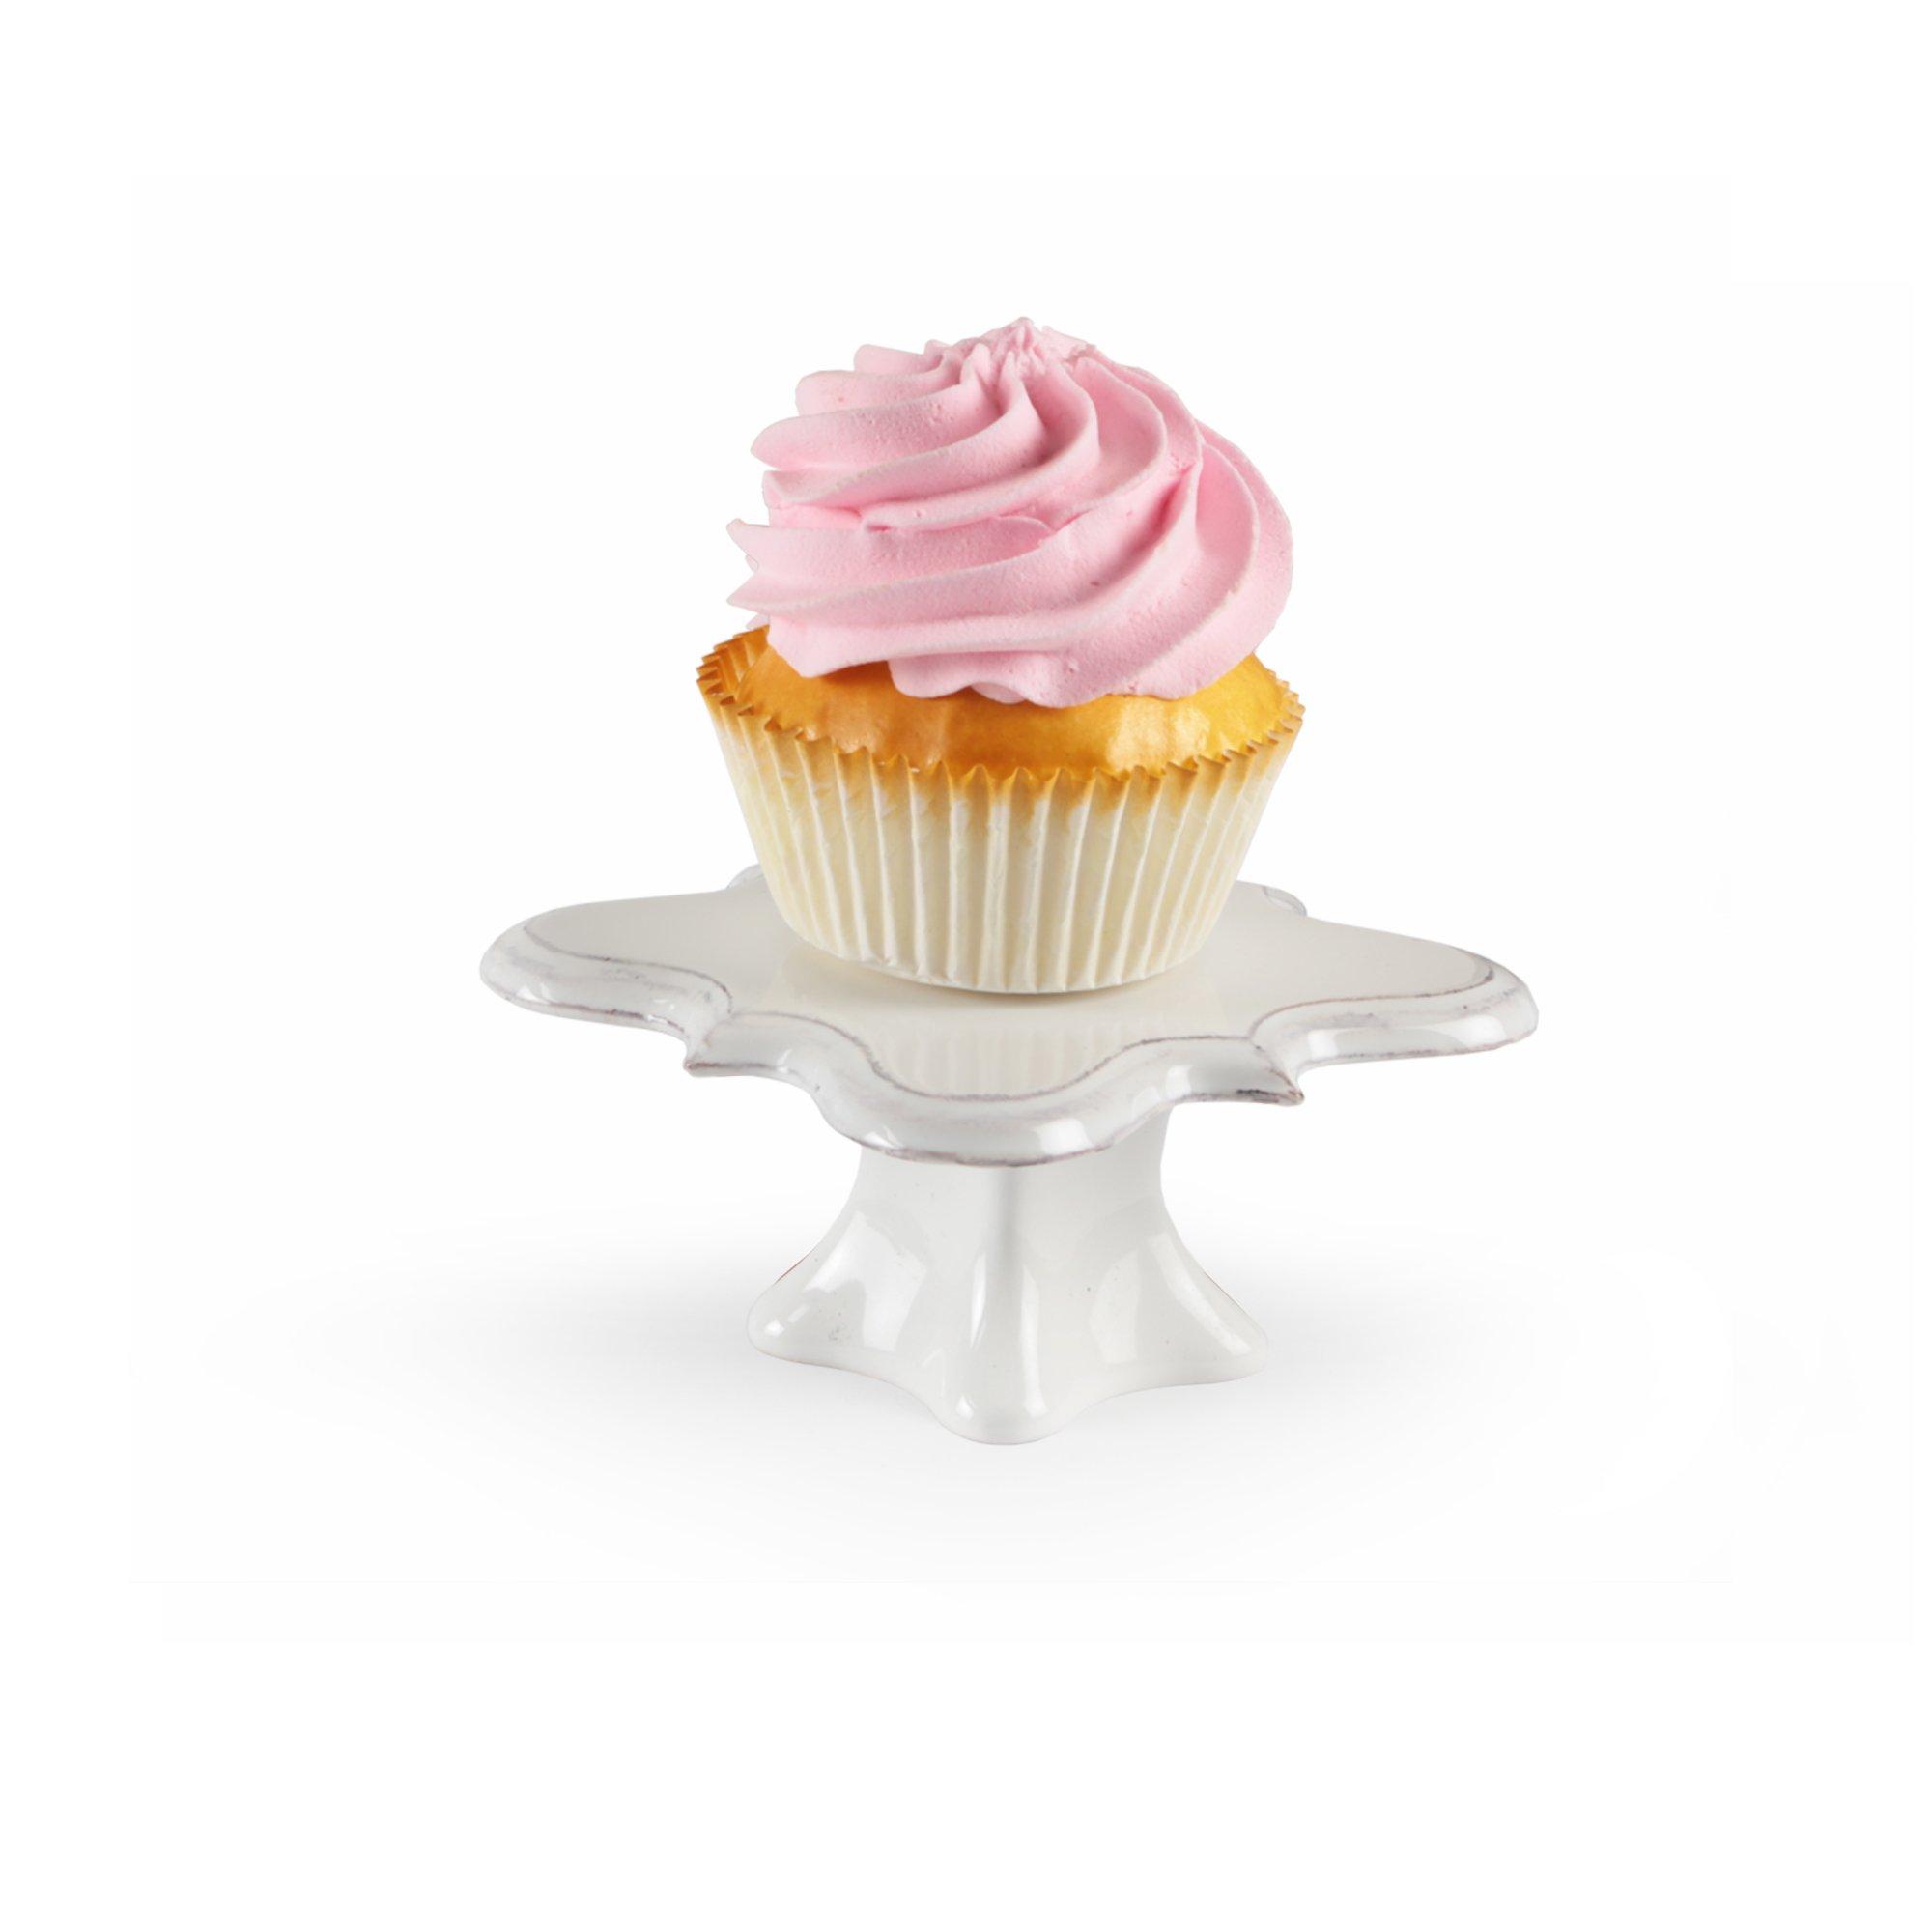 American Atelier 1562242 Bianca Square Cupcake Pedestal Plates (Set of 4), White